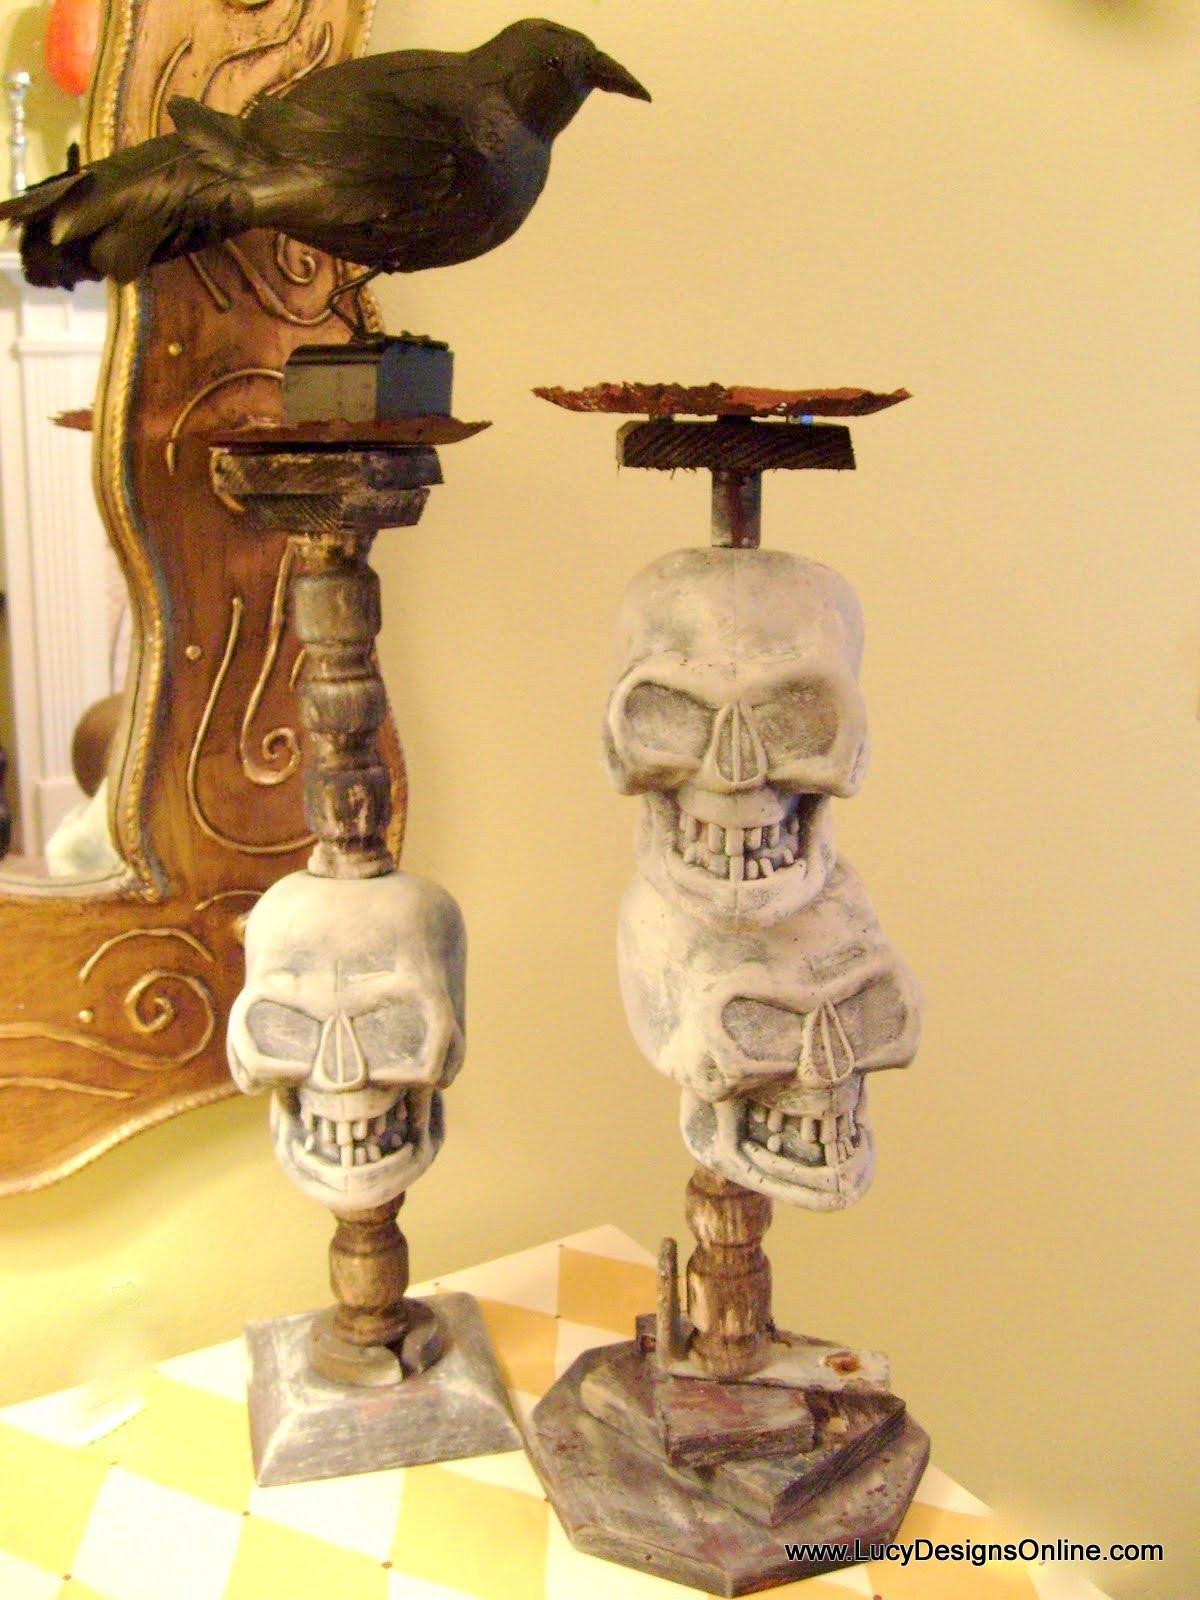 http://i1.wp.com/1.bp.blogspot.com/_Tbet6eC-dwc/TKkRXO8I2FI/AAAAAAAABVw/8qHj5-BiupA/s1600/halloween+047.JPG?resize=419%2C559